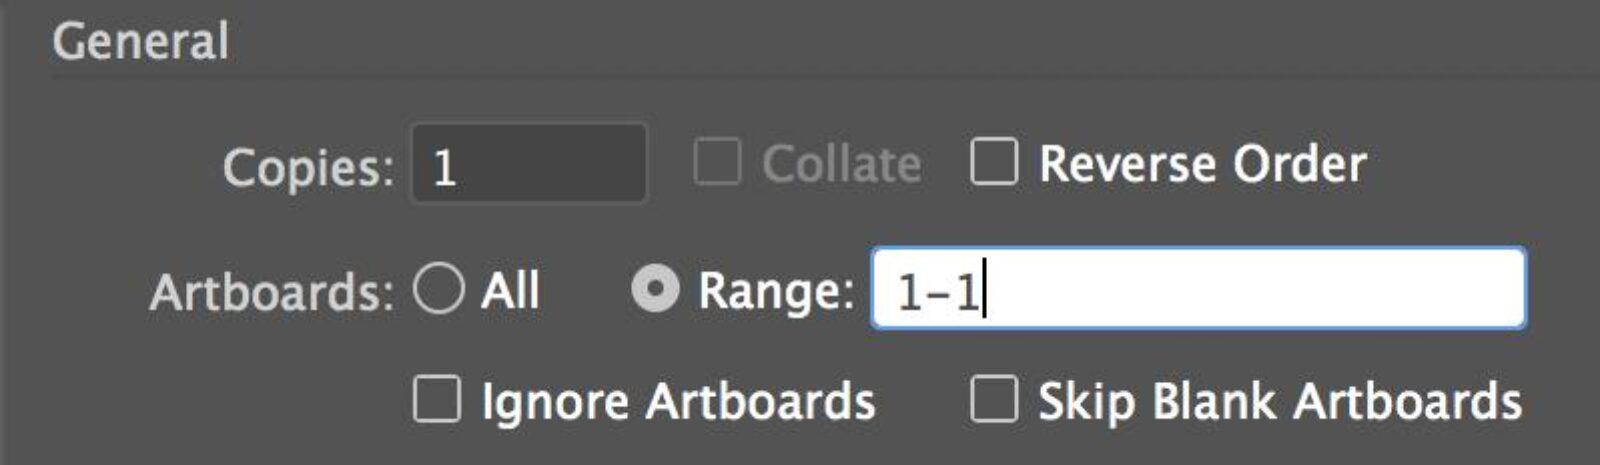 Select Artboard Page Range